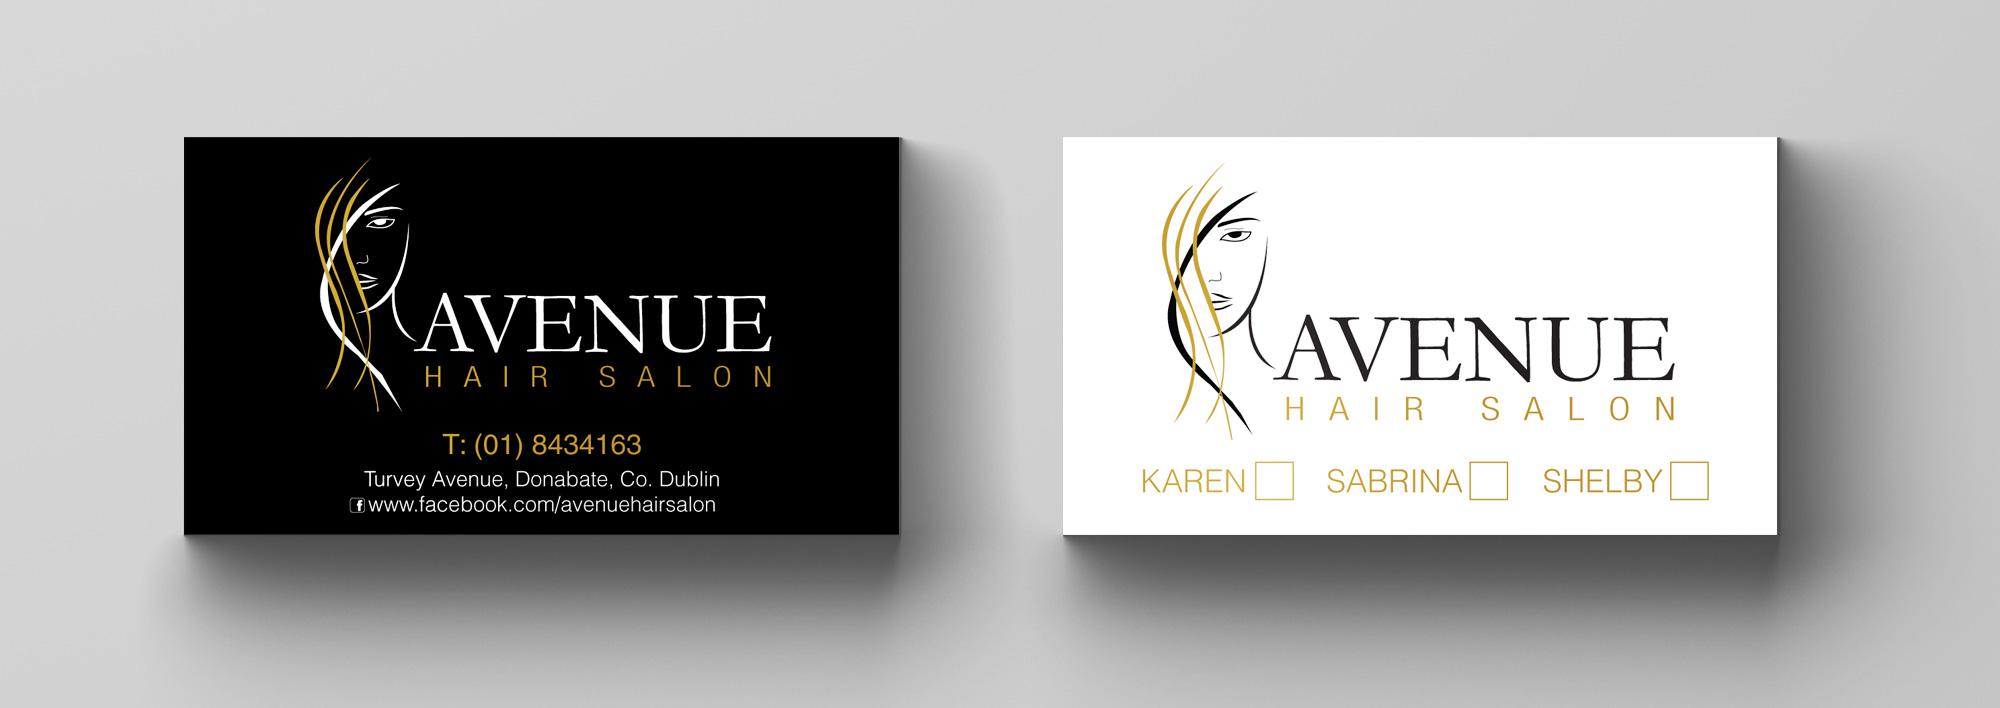 Avenue Hair Salon | Codesign Graphics